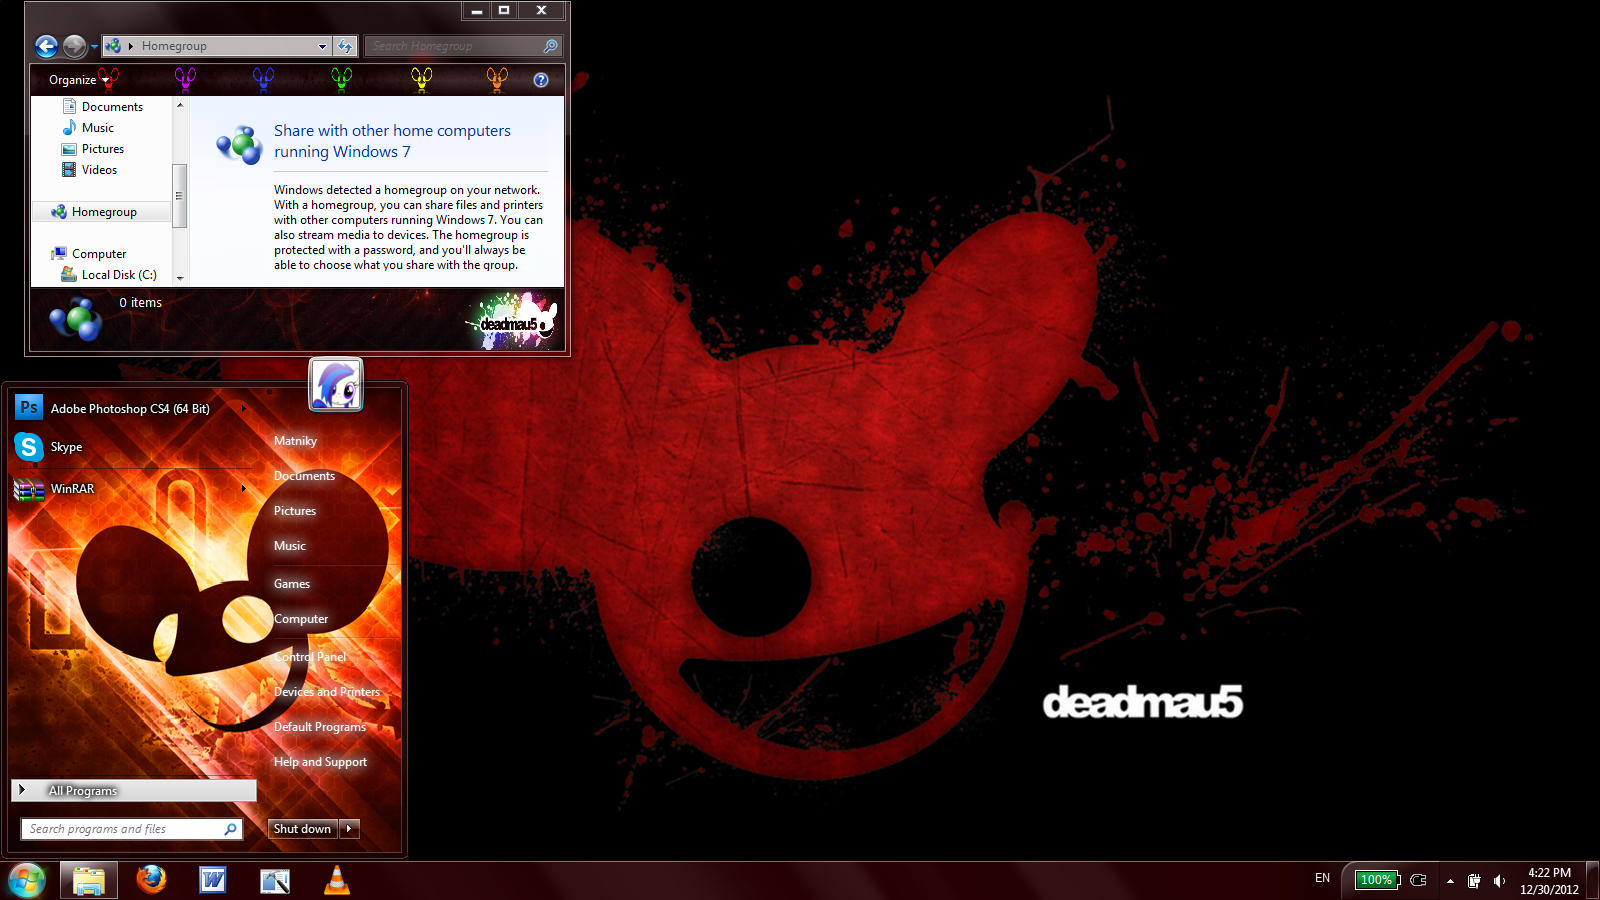 Deadmau5 windows 7 theme by Matniky